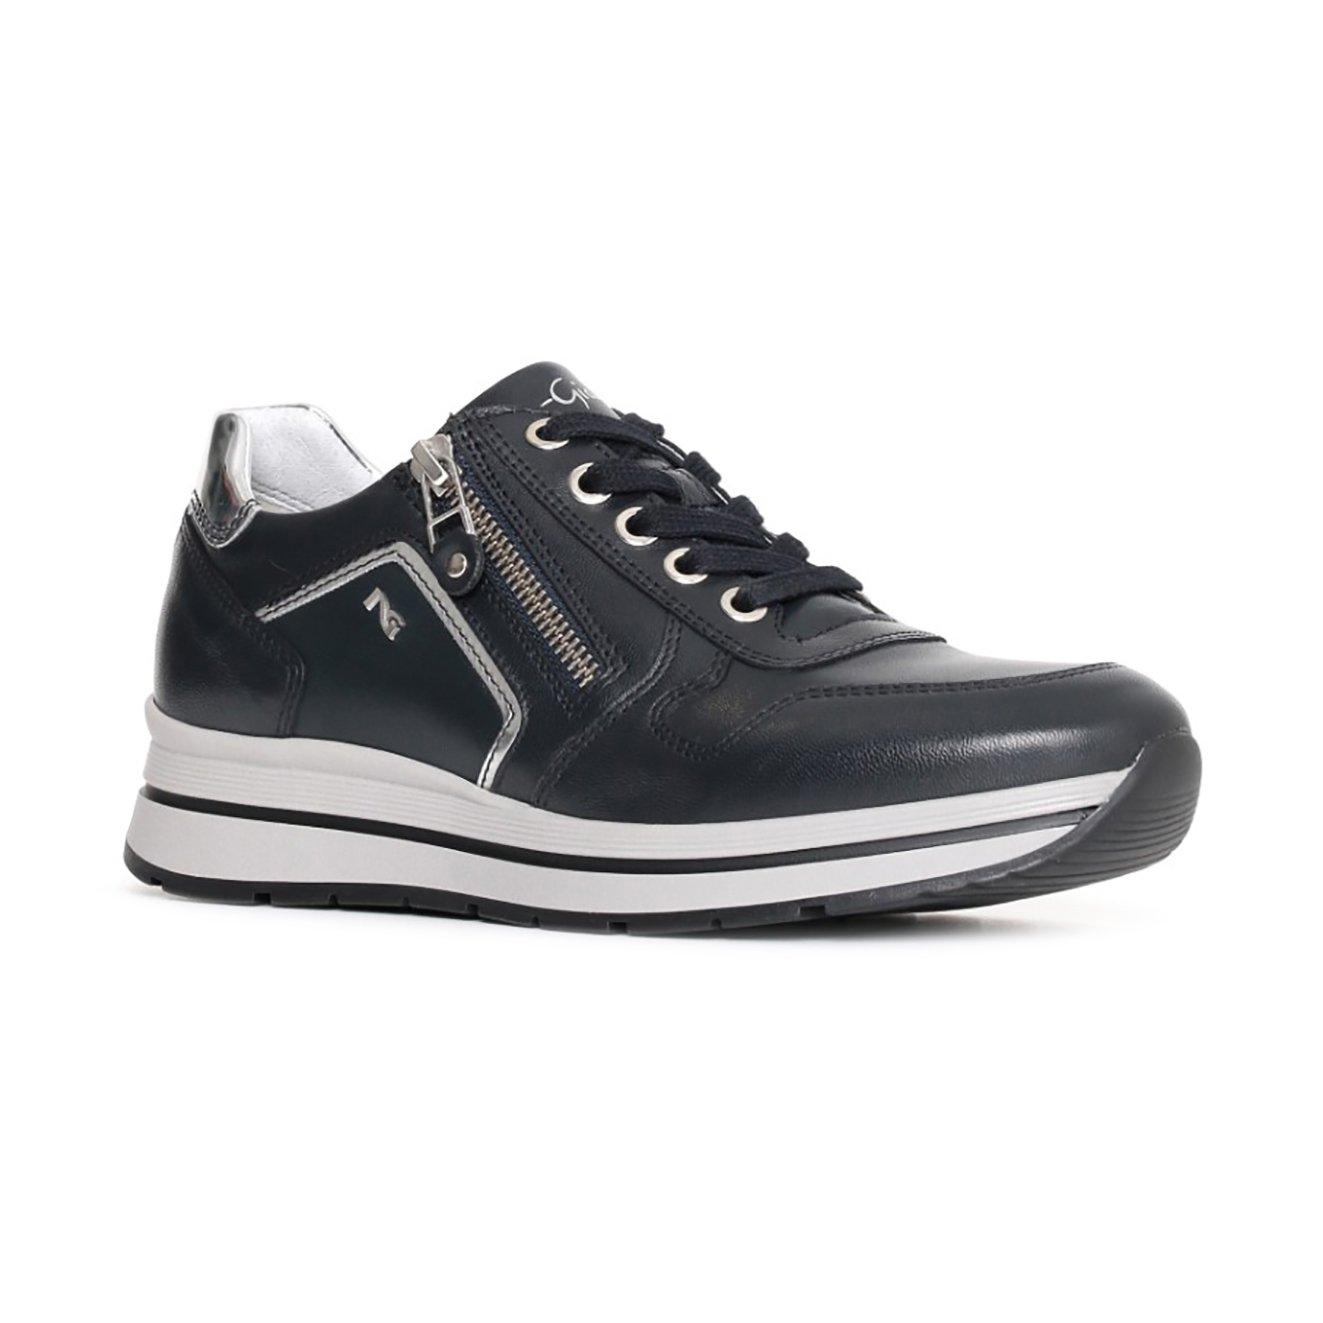 Giardini Donna Nero A719480d204 Sneaker Argento Pelle In Scarpe NO8Z0PknwX